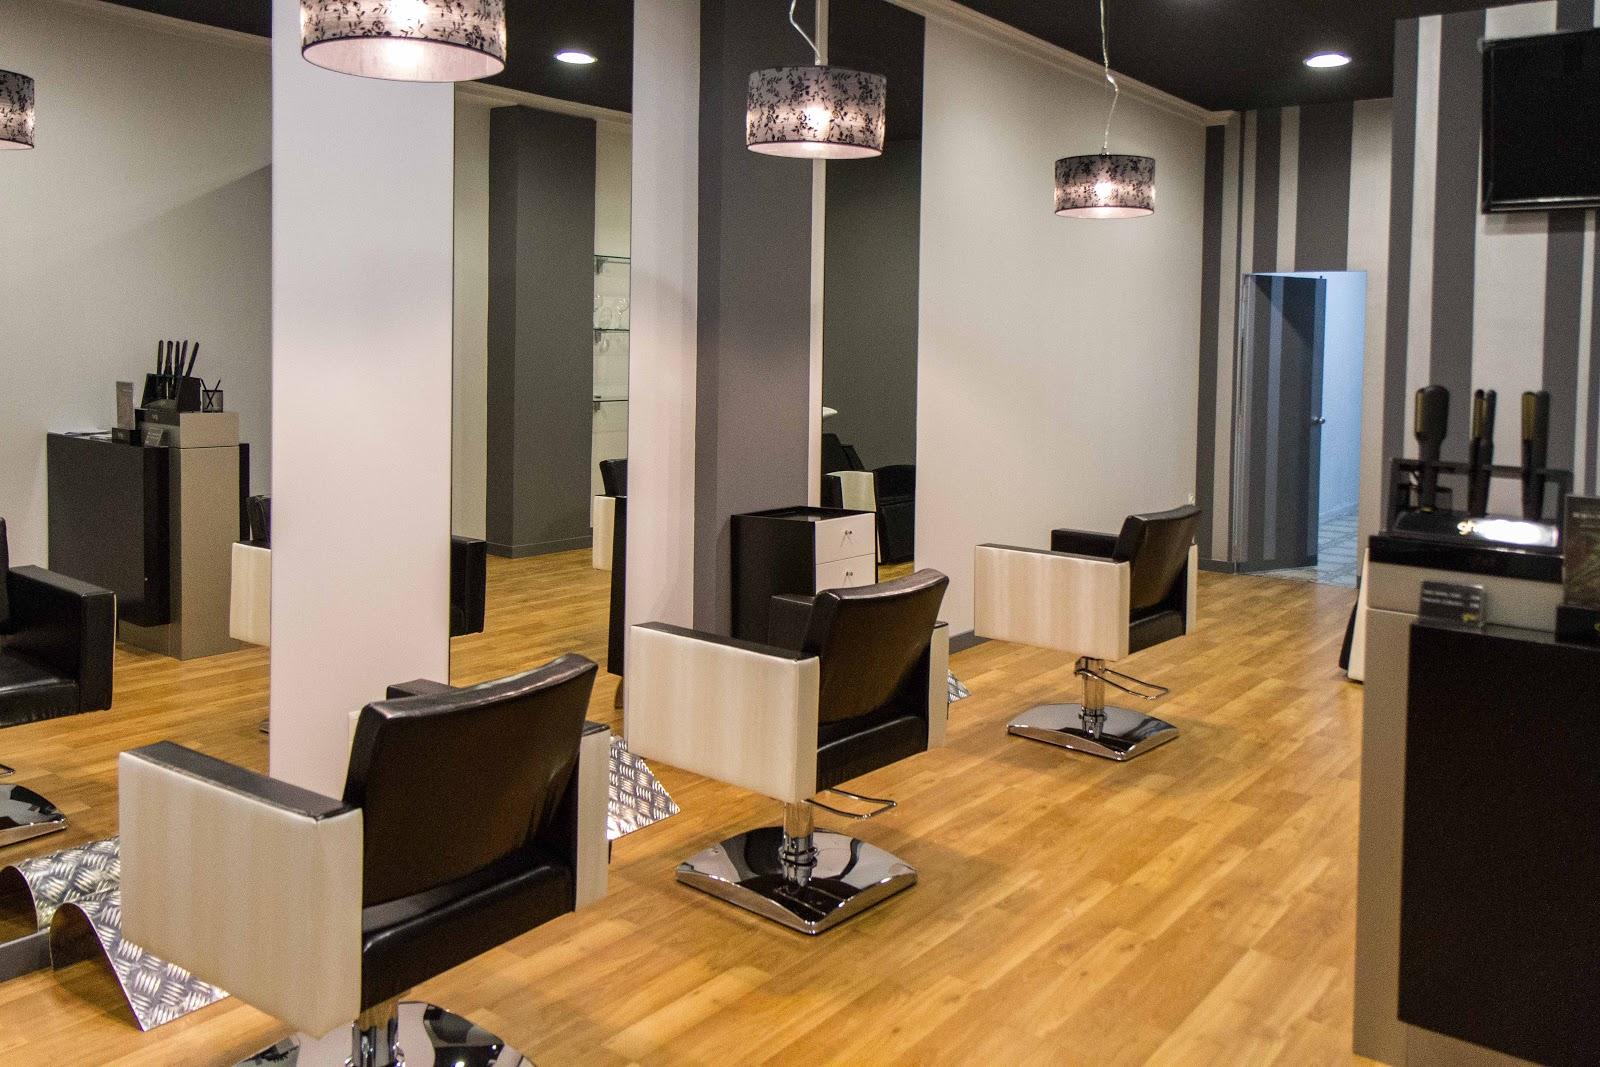 Fotos de mobiliario de peluqueria for Segunda mano muebles de peluqueria